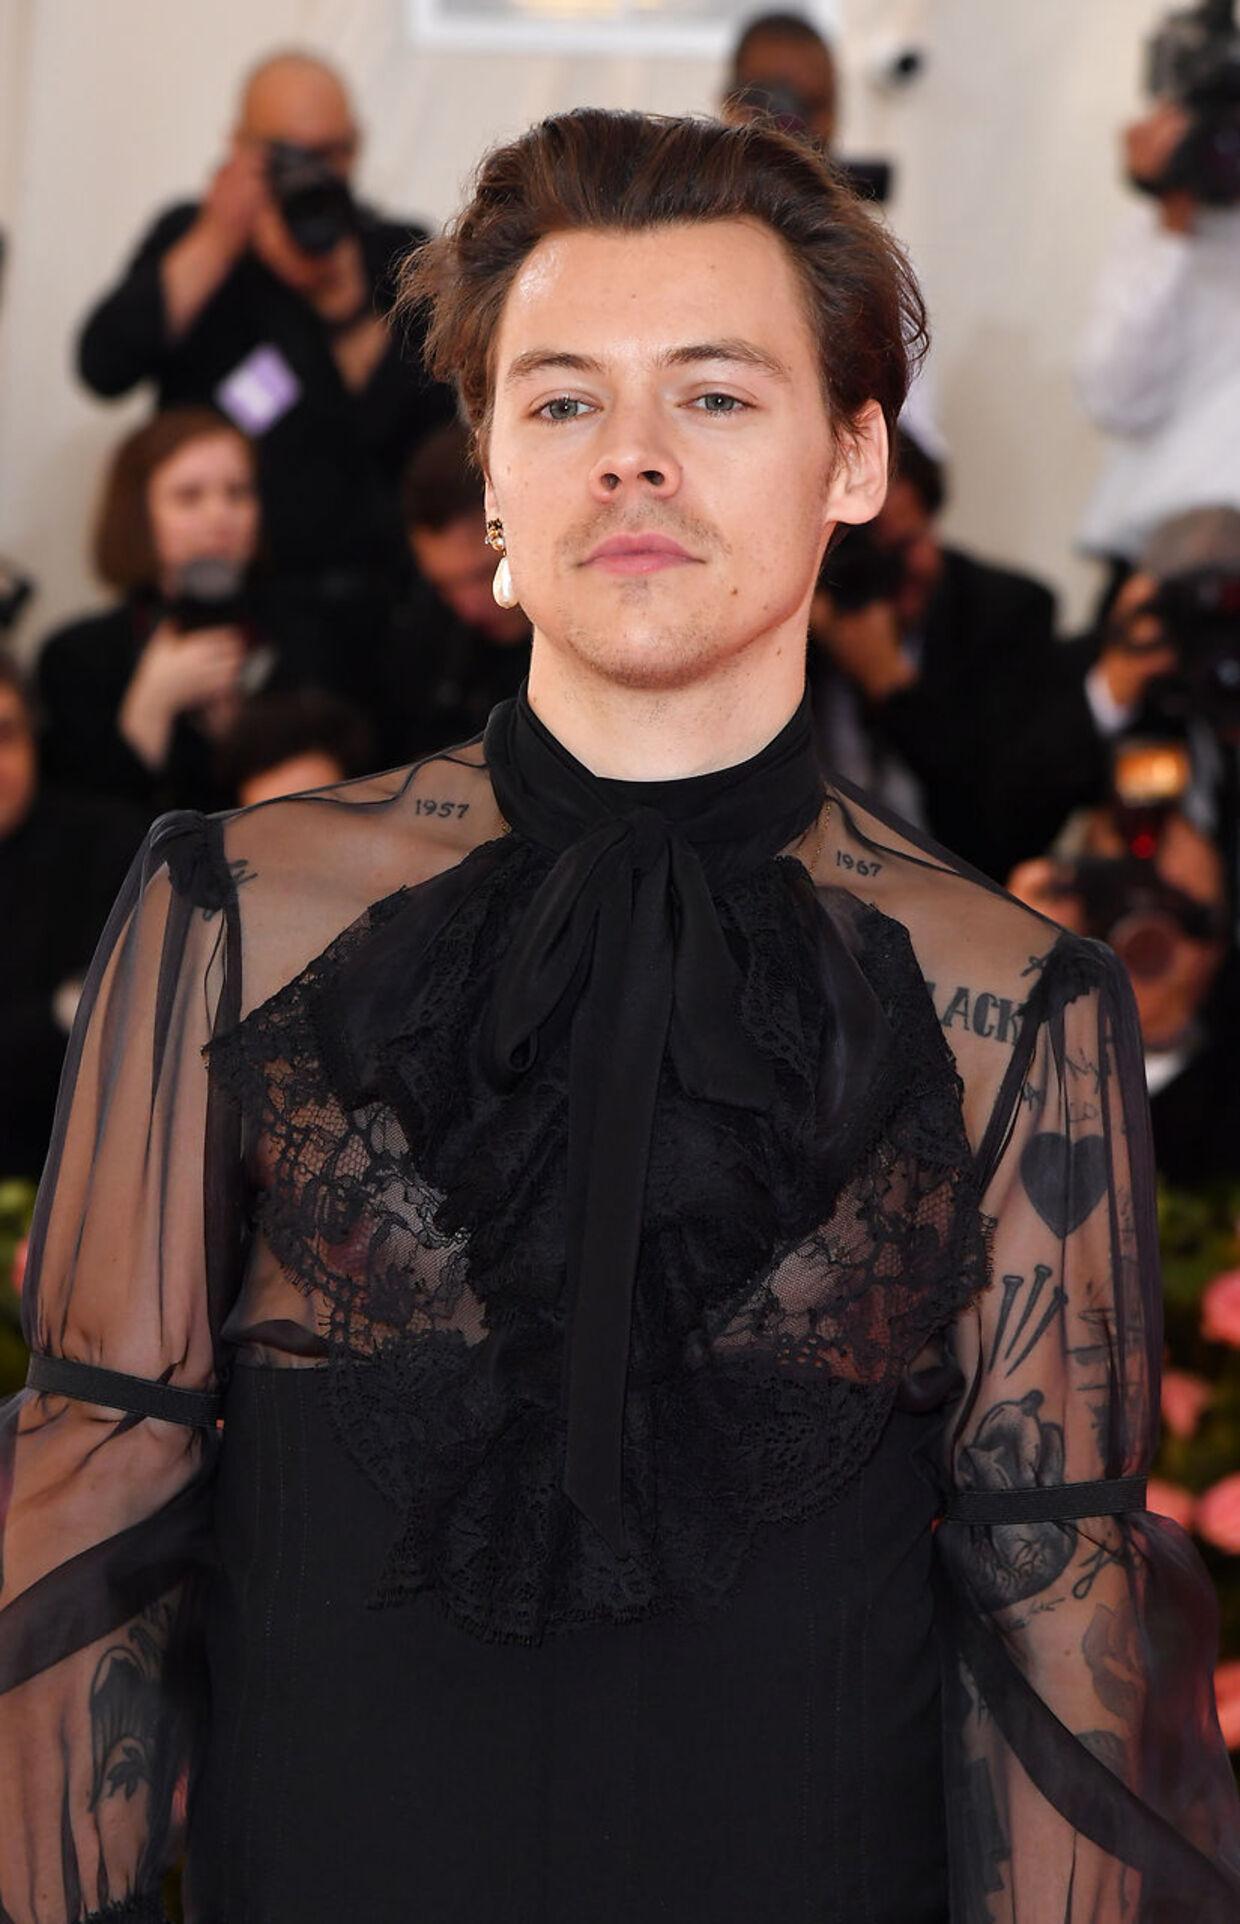 Harry Styles til gallafest i Metropolitan Museum of Art i maj 2019, i New York. Foto ANGELA WEISS / AFP